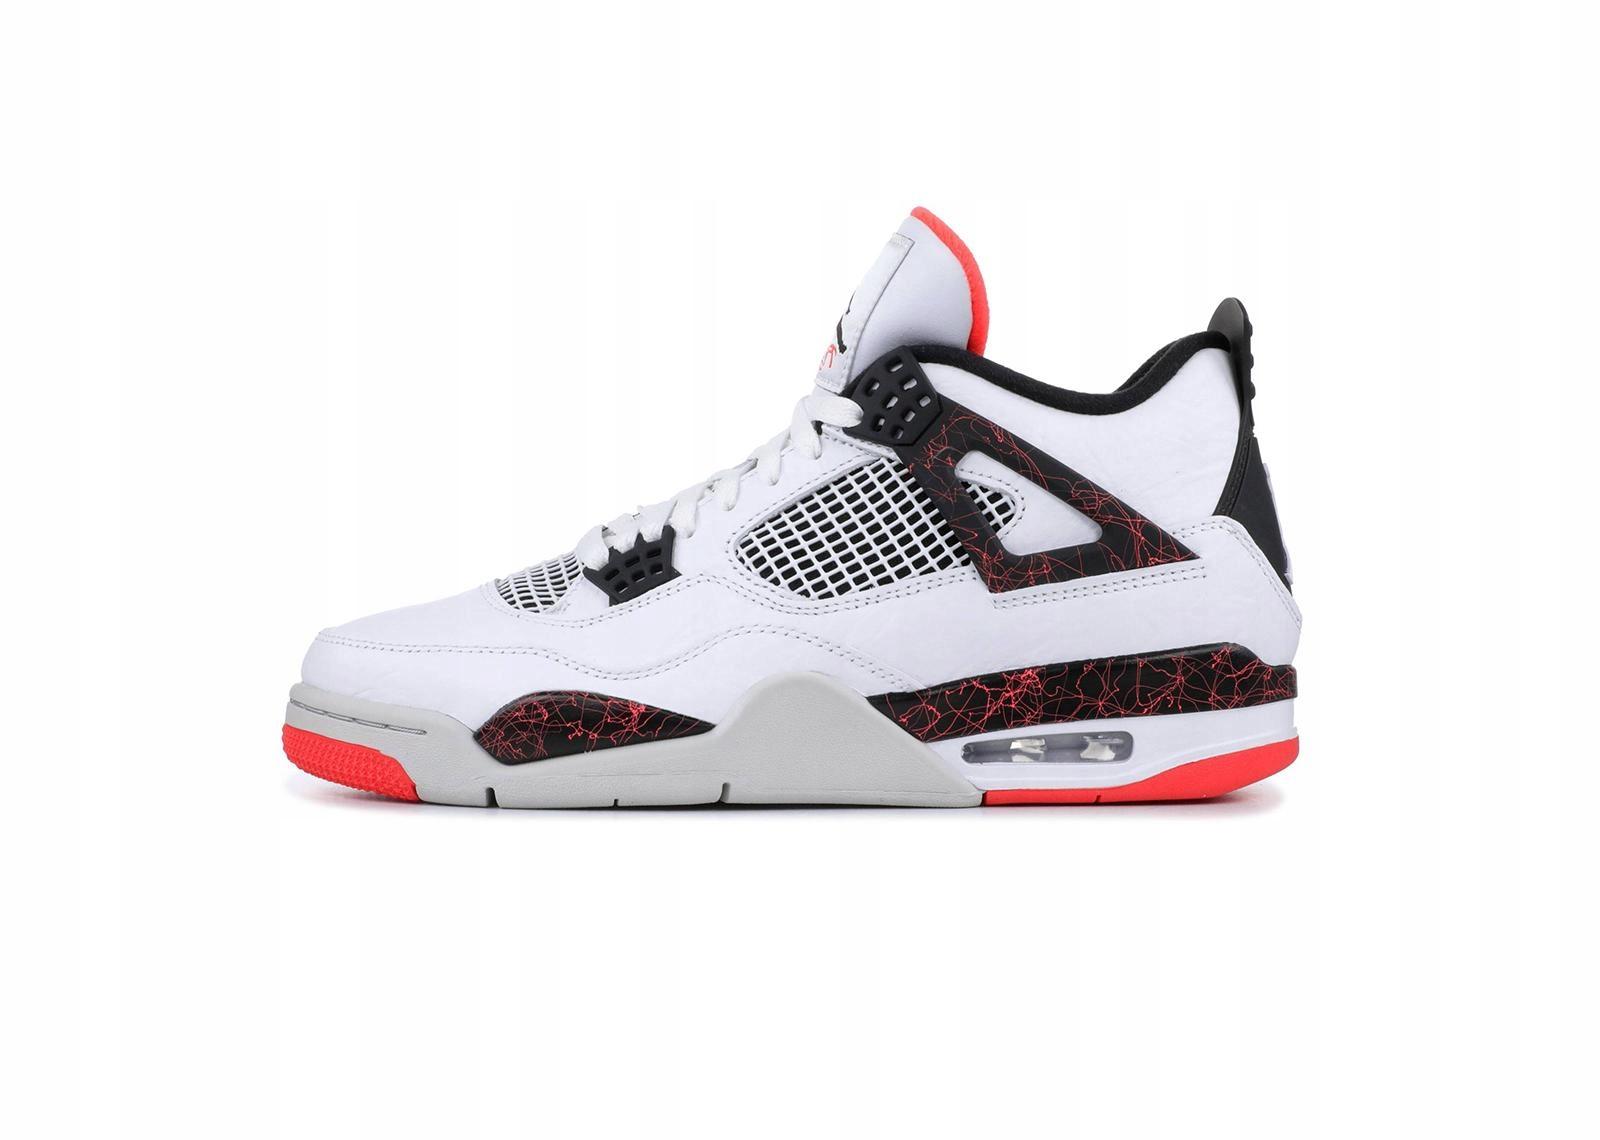 Nike Air Jordan 4 Retro Flight Nostalgia 11